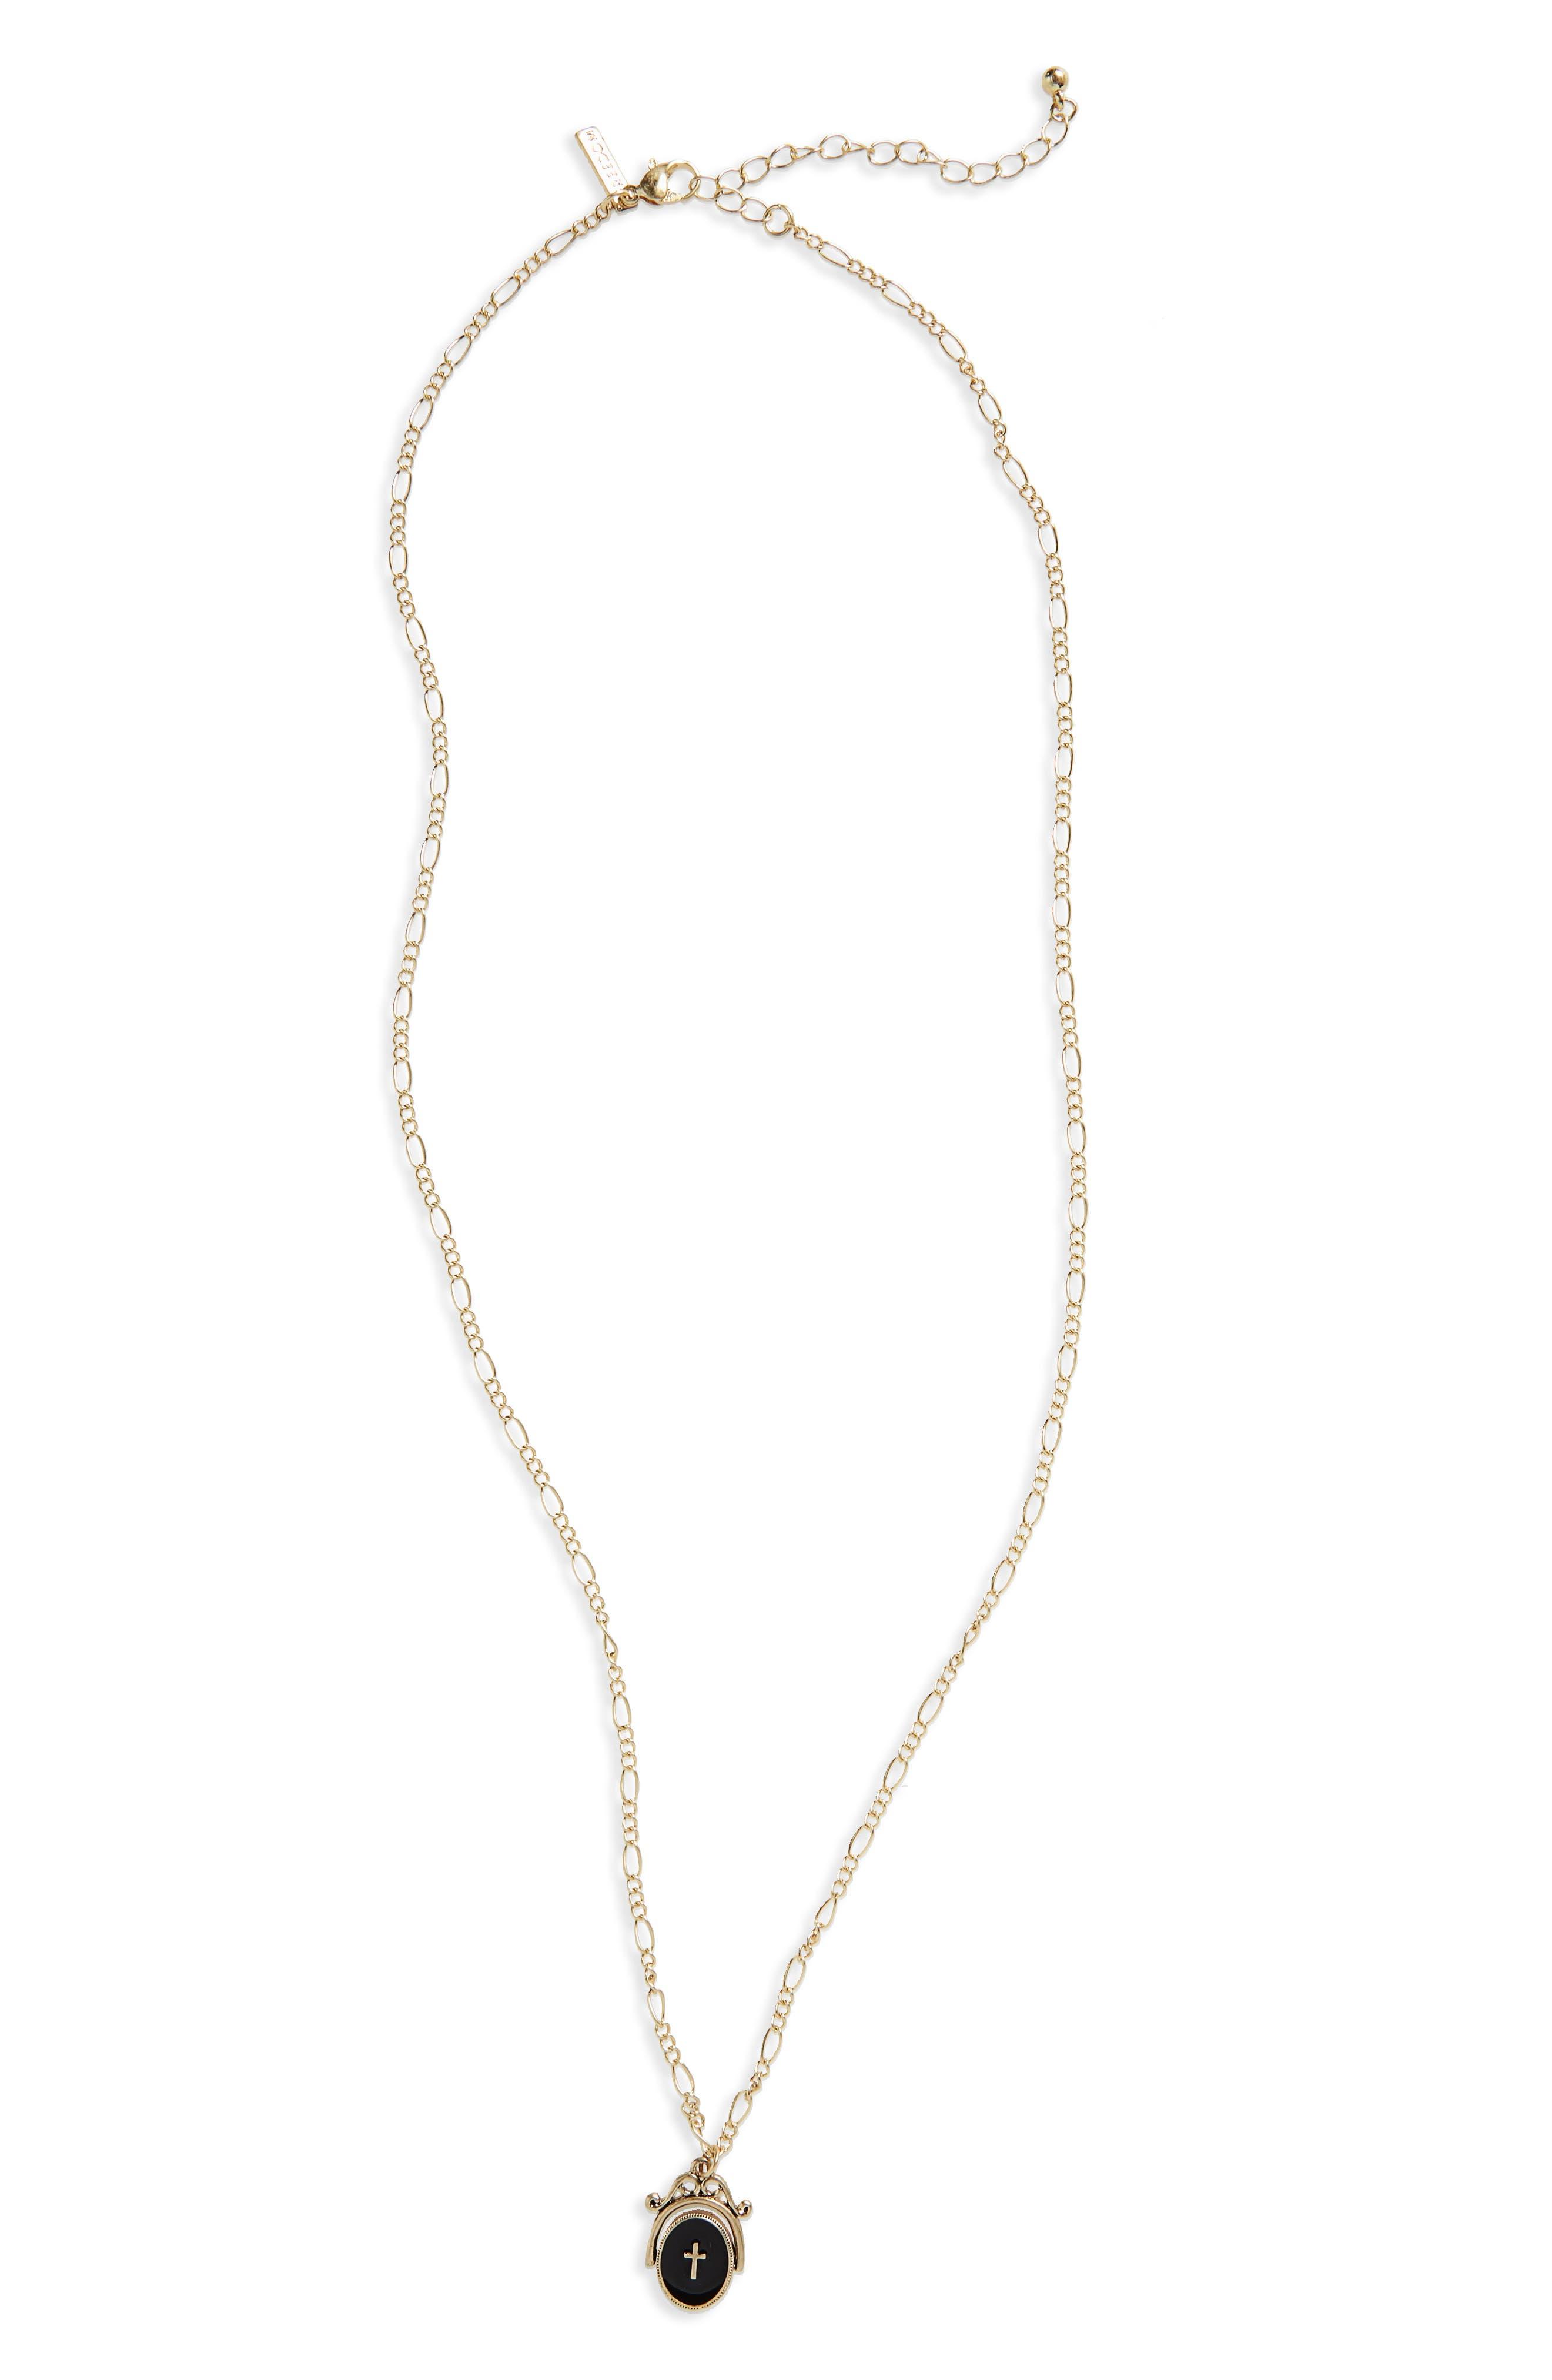 Cross Coin Necklace,                             Main thumbnail 1, color,                             710